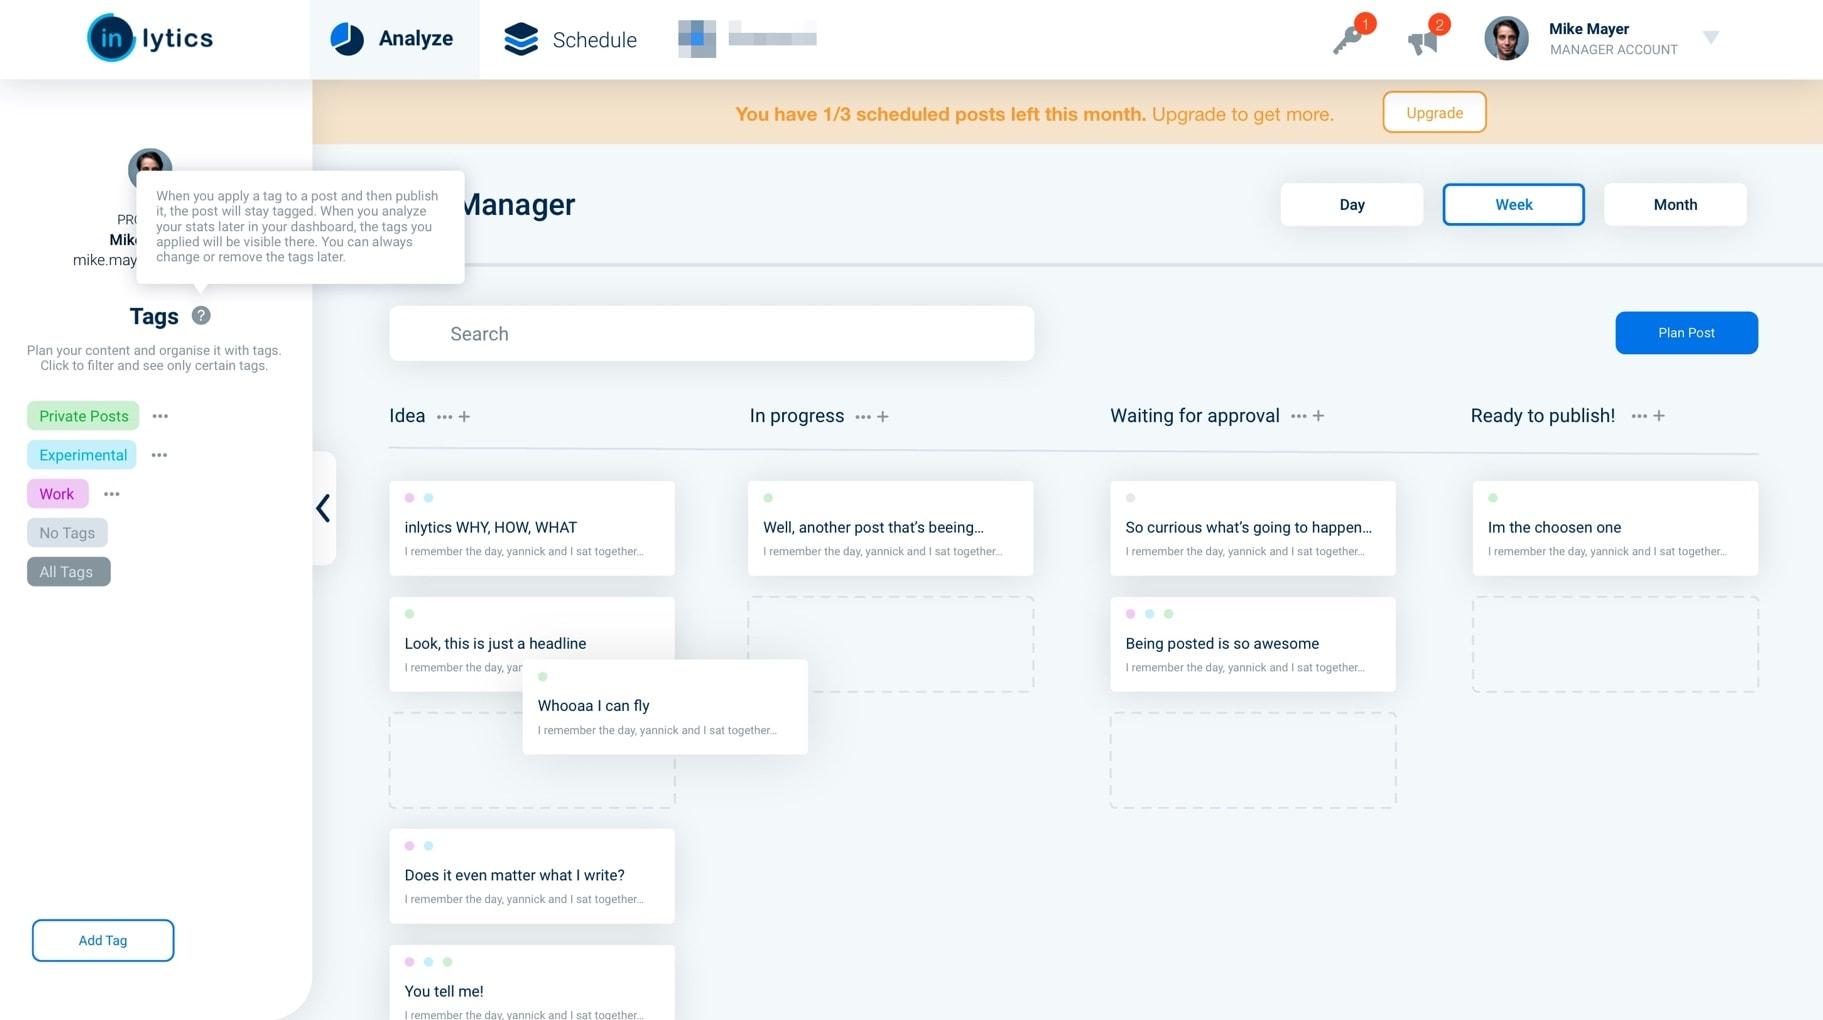 inlytics LinkedIn Analytics draft for content planning